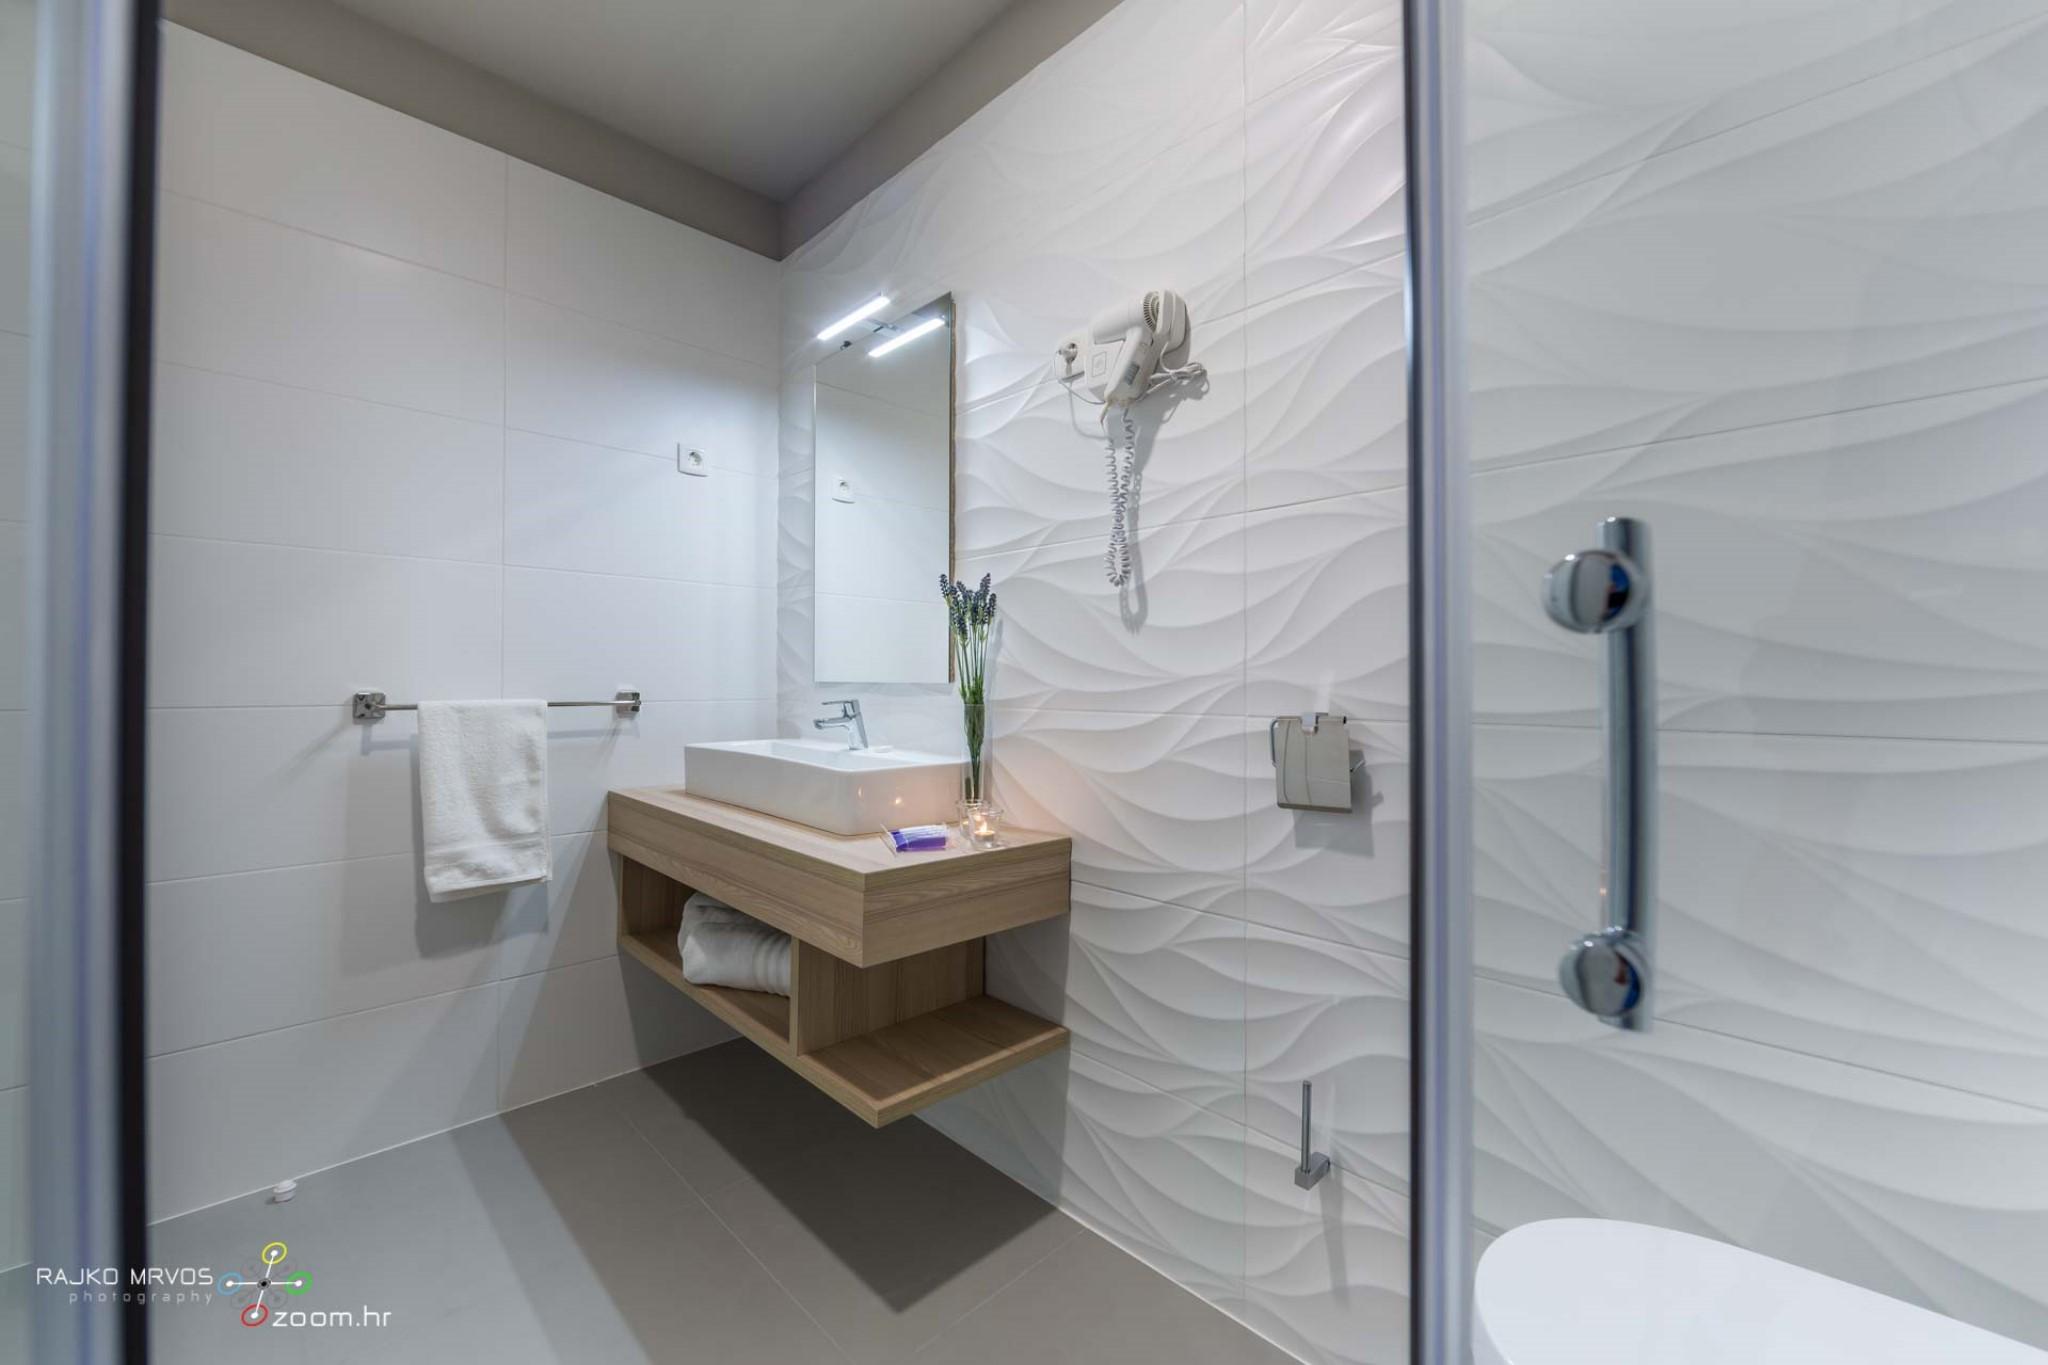 fotografiranje-interijera-fotograf-eksterijera-apartmana-vila-kuca-apartmani-Preelook-55